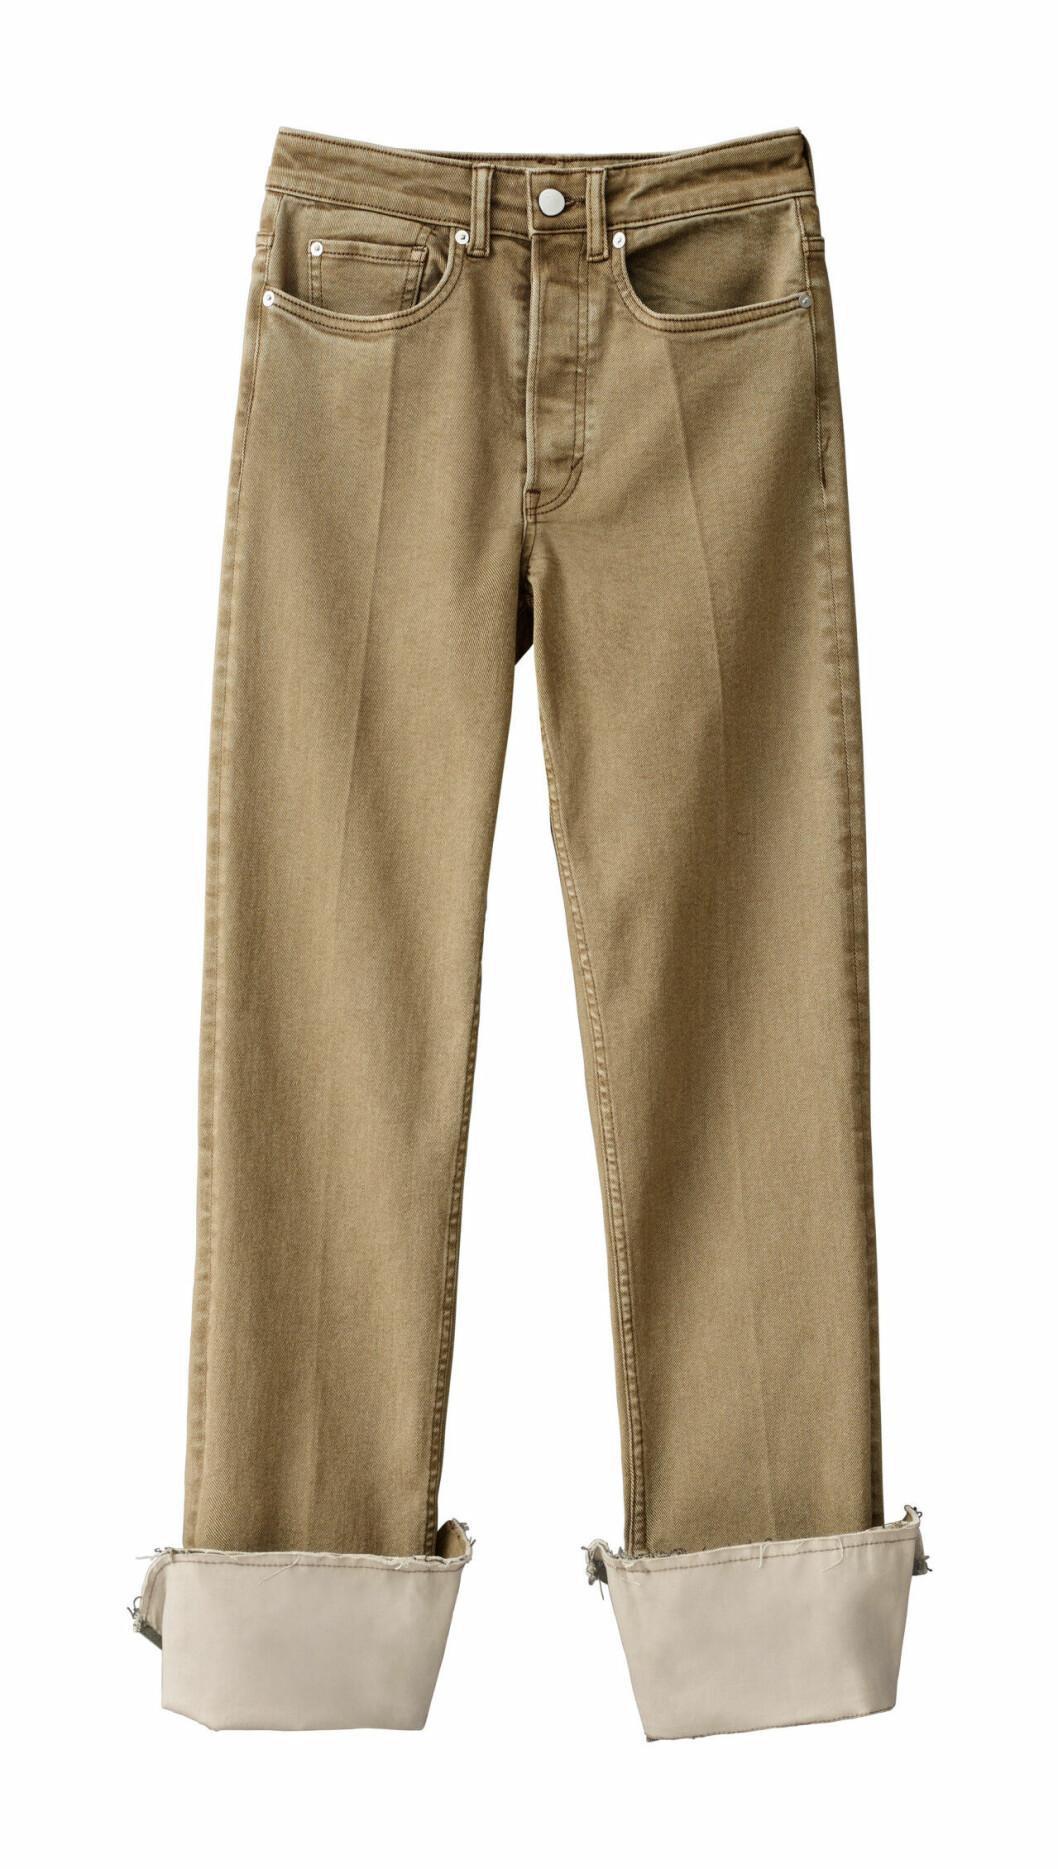 H&M Studio höstkollektion aw 2019 – beige jeans